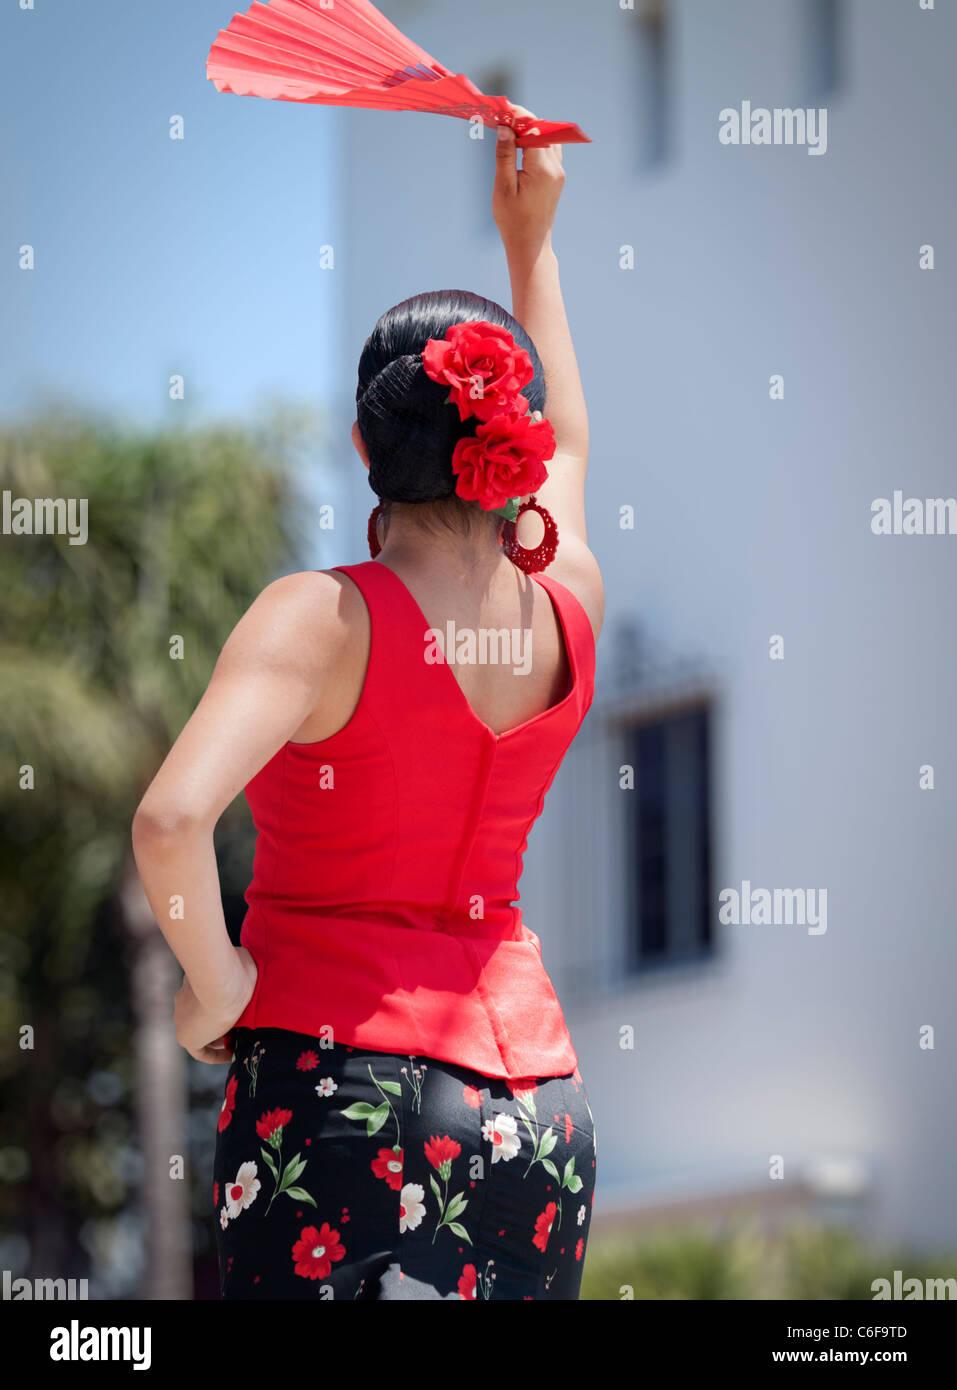 Flamenco dancer waiting to start her performance - Stock Image